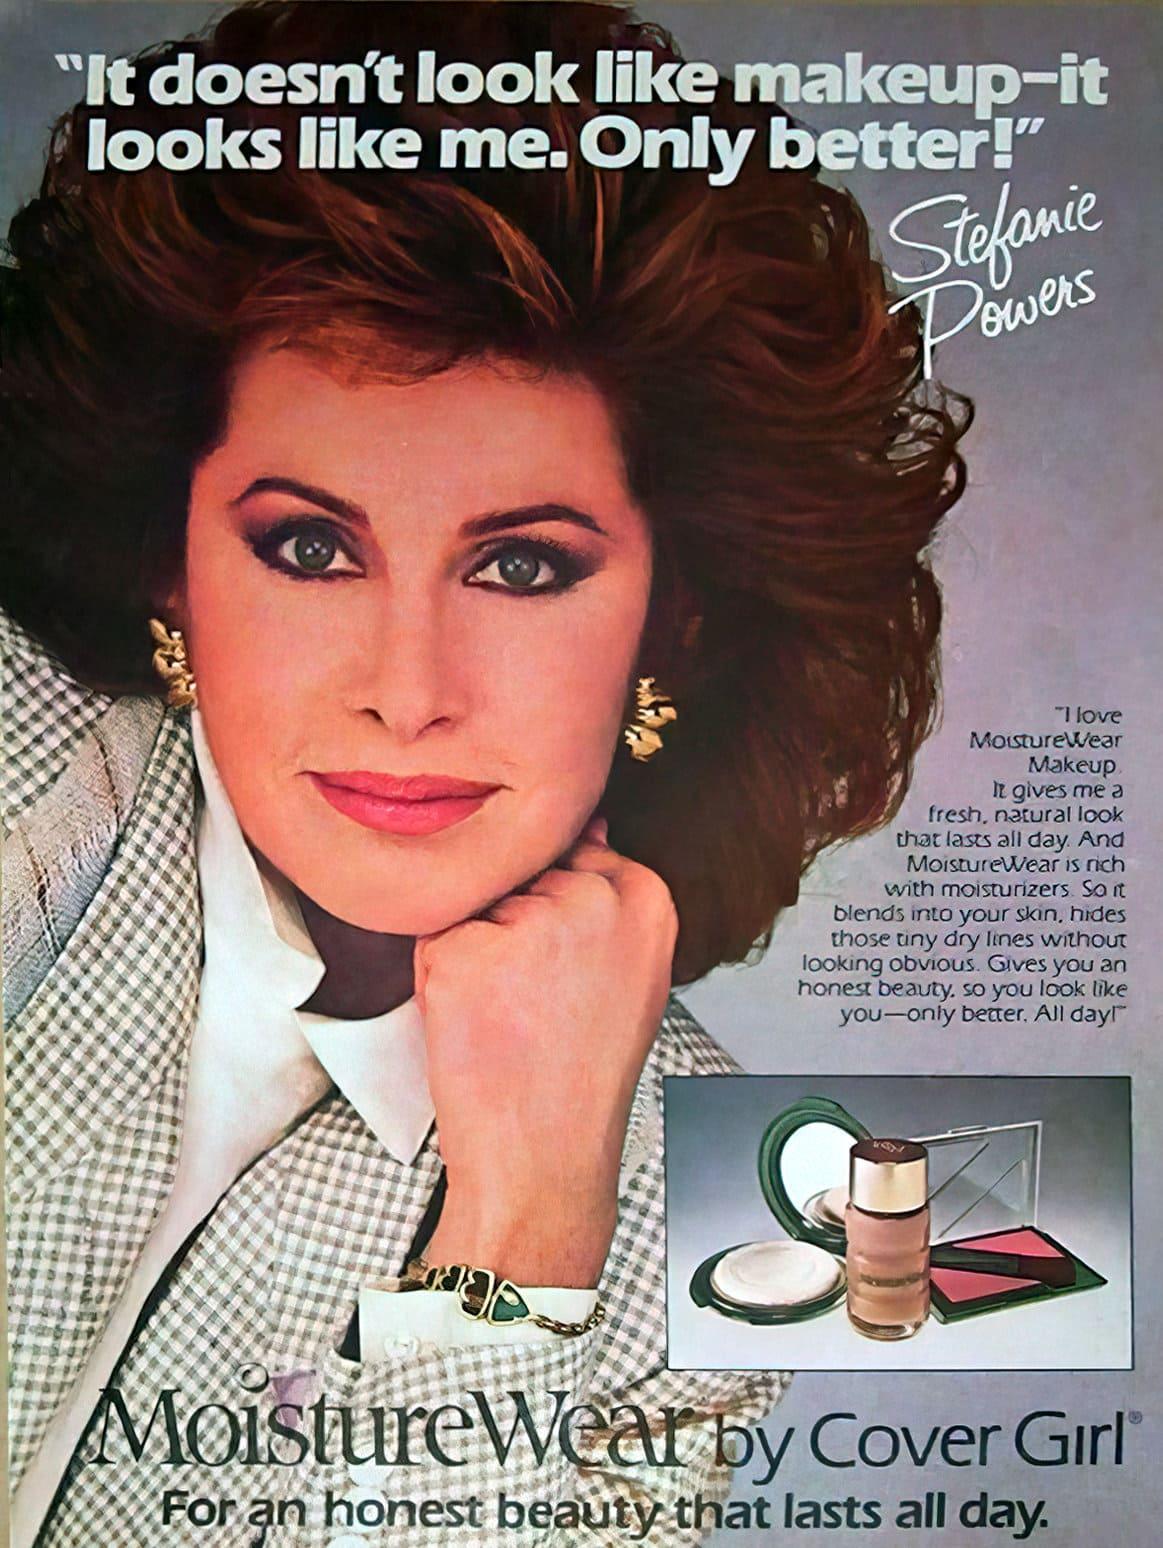 Vintage Stefanie Powers ad for MoistureWear makeup (1980s)